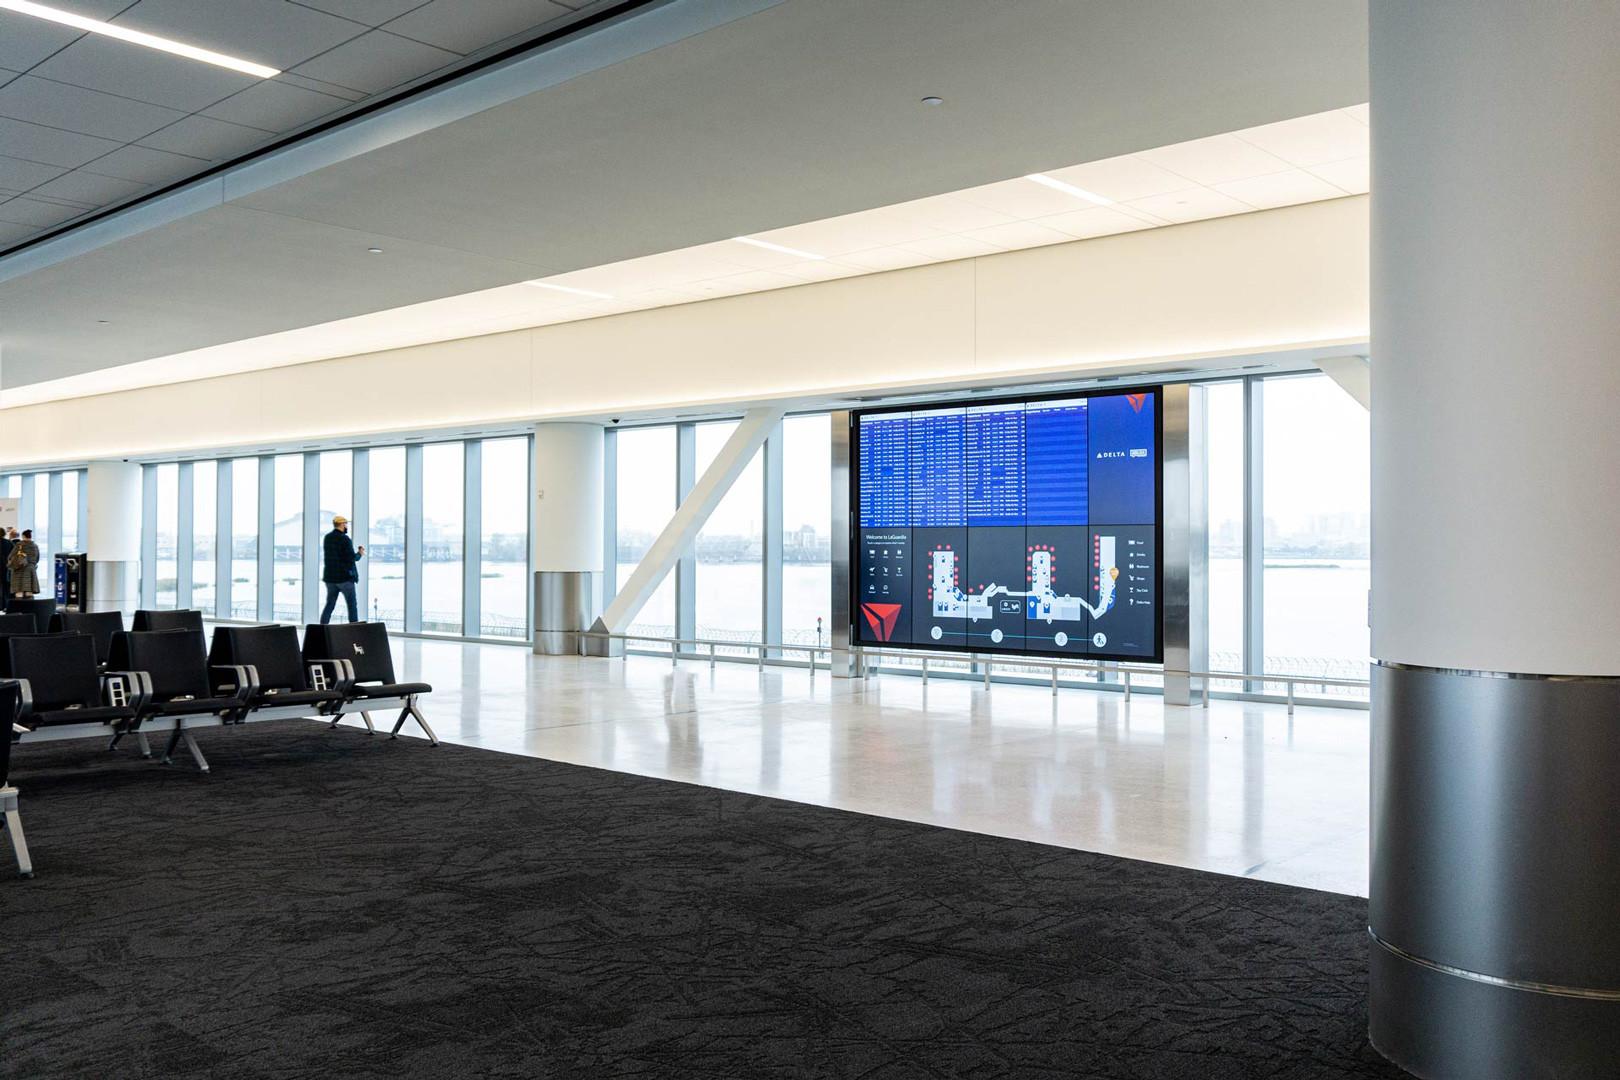 Interior-Delta-new-Concourse-G-LGA-1.jpg